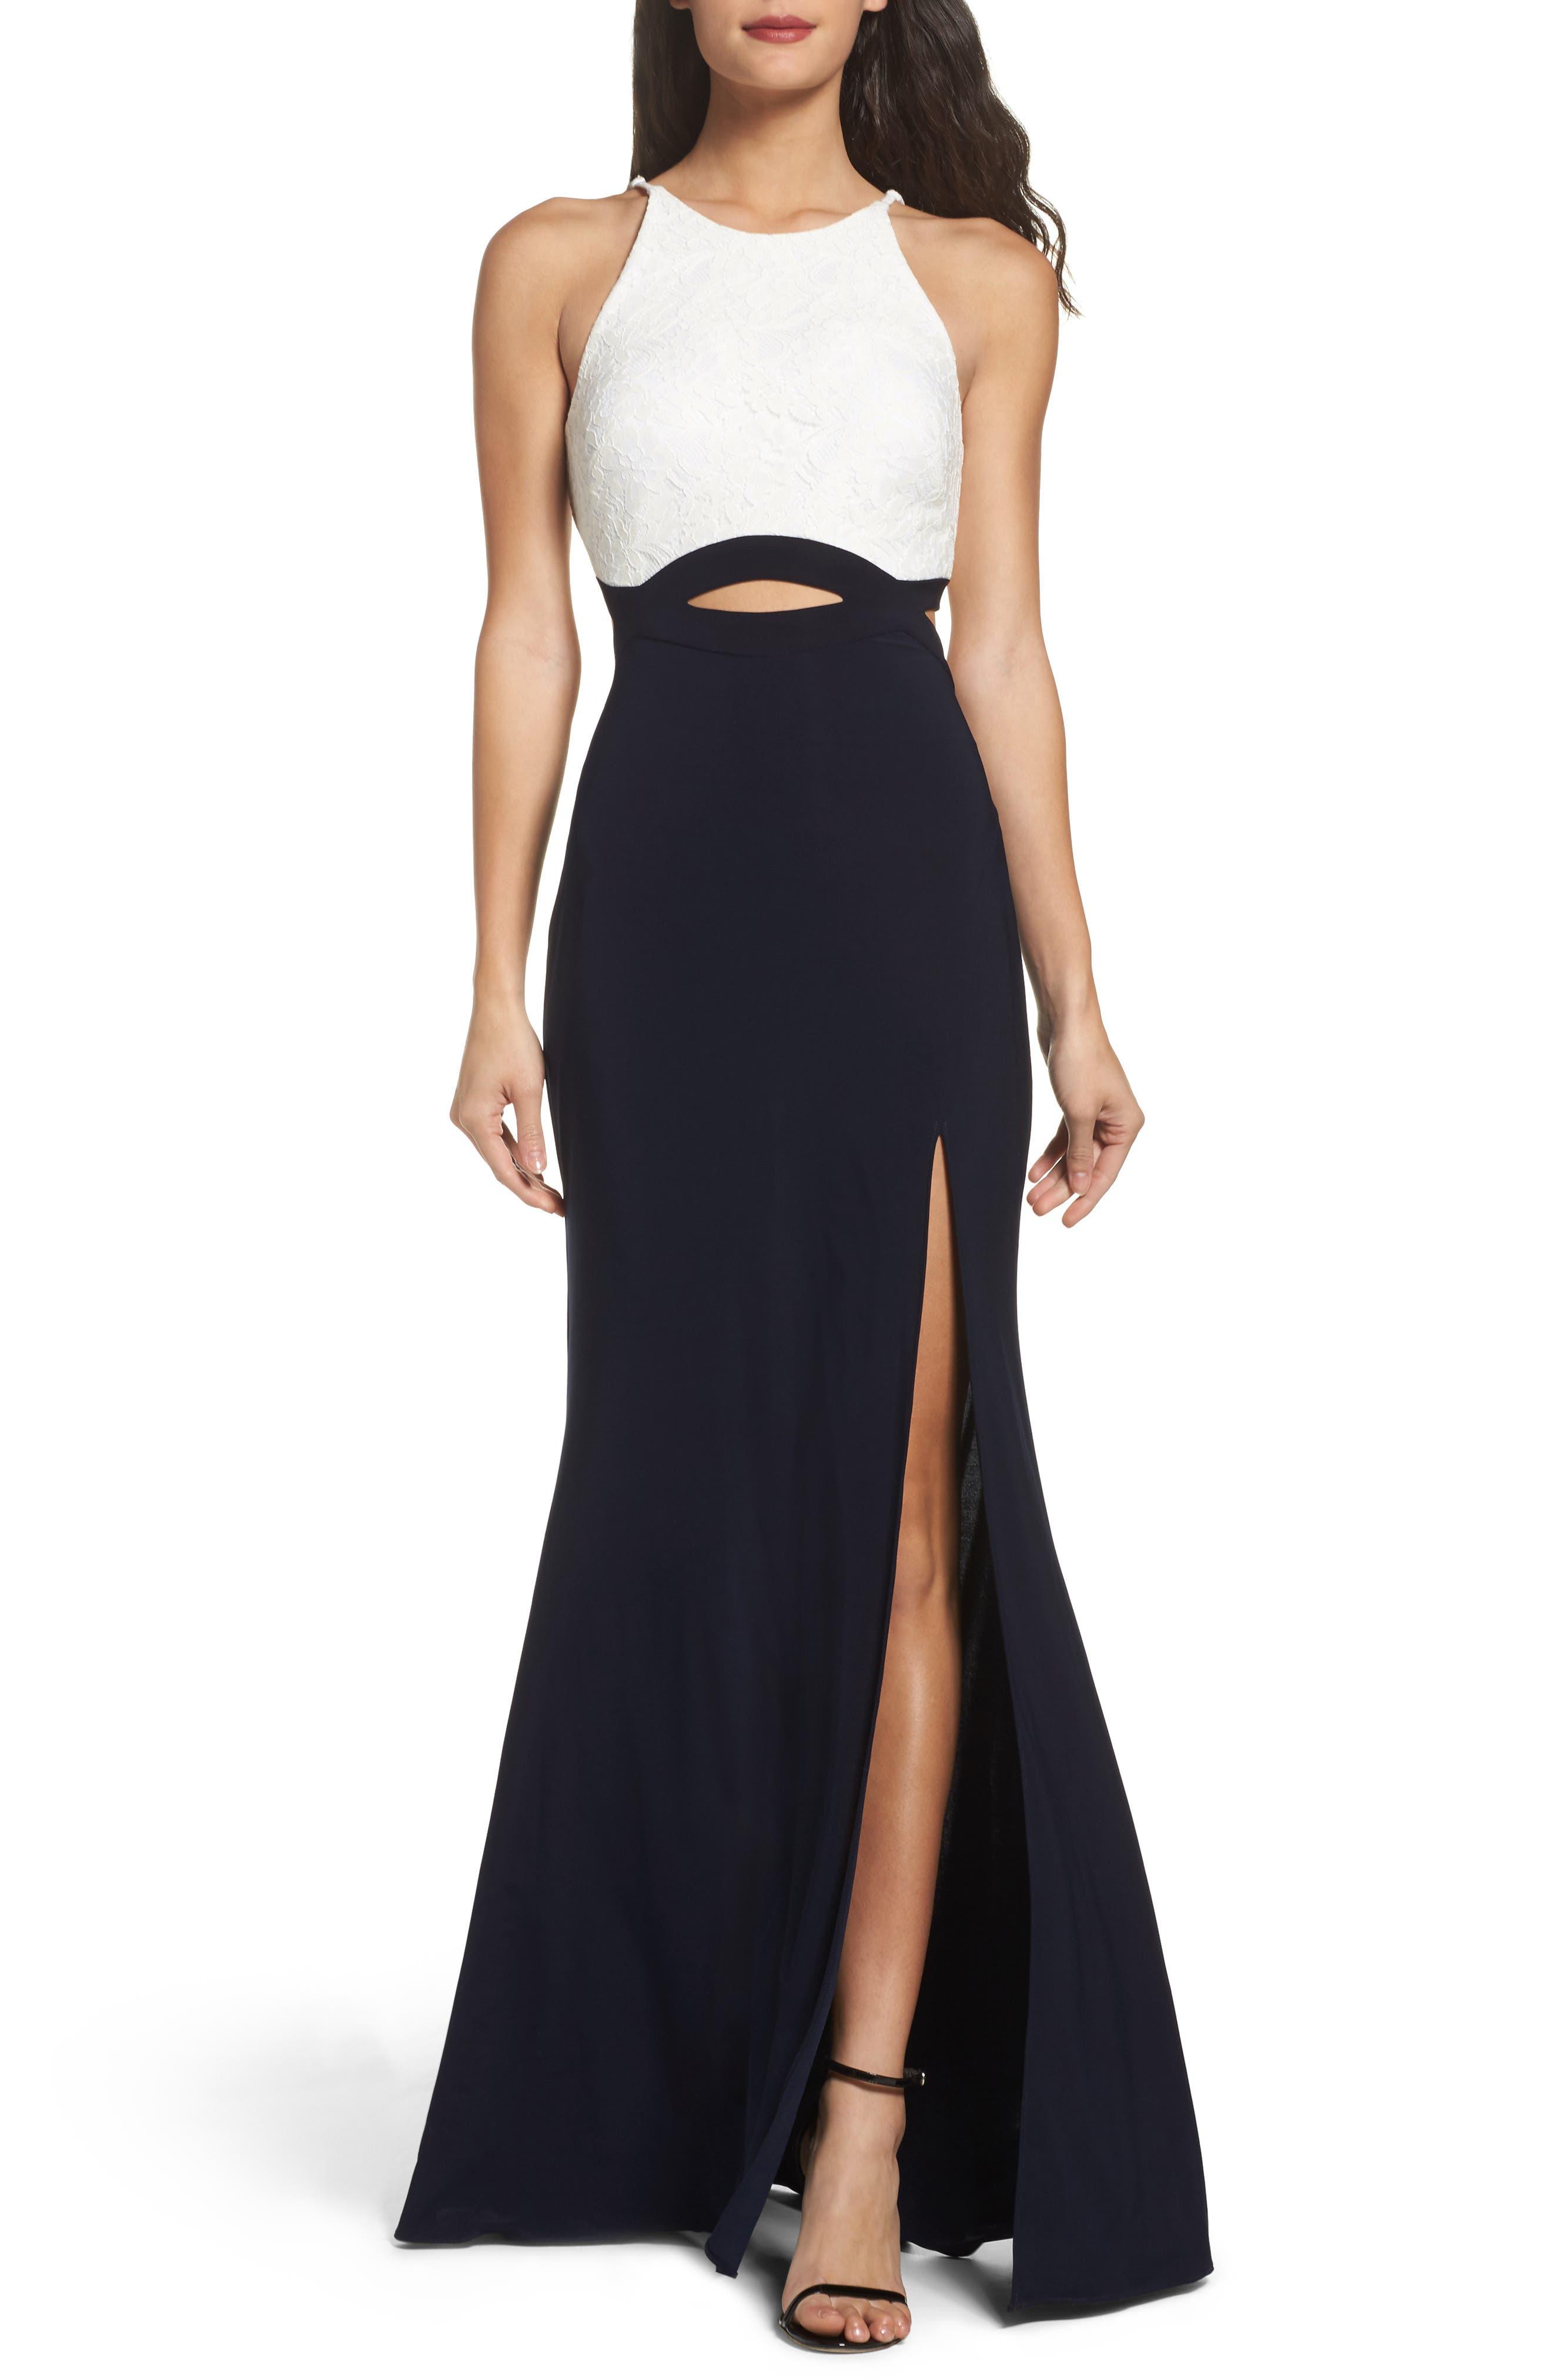 Blondie Nites Colorblock Lace Gown